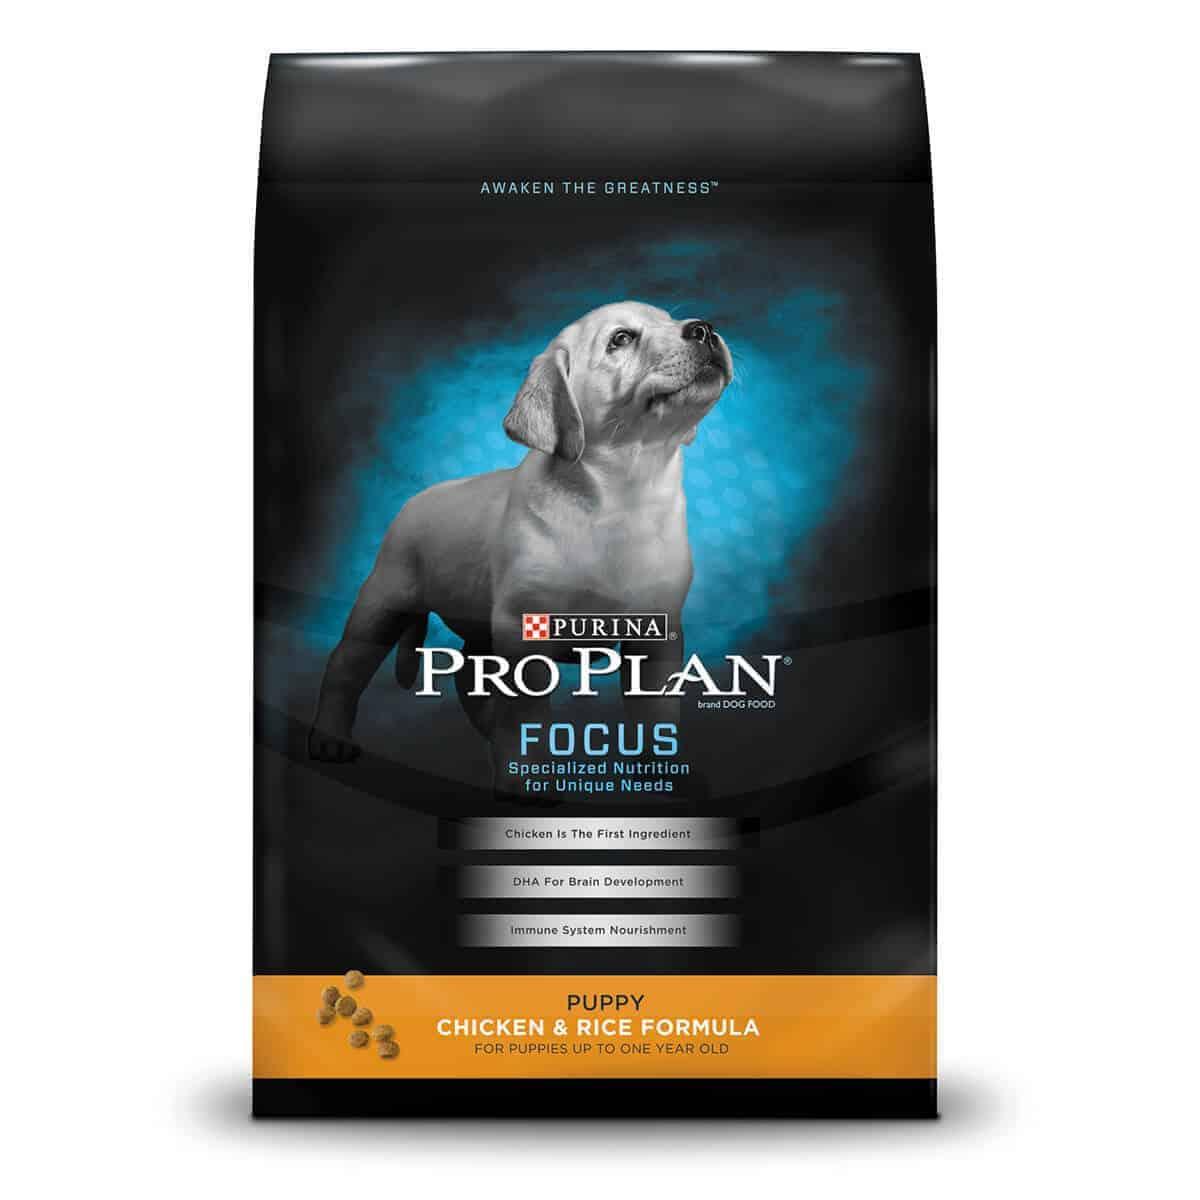 Purina Pro Plan Focus Puppy Chicken & Rice, 6 lb